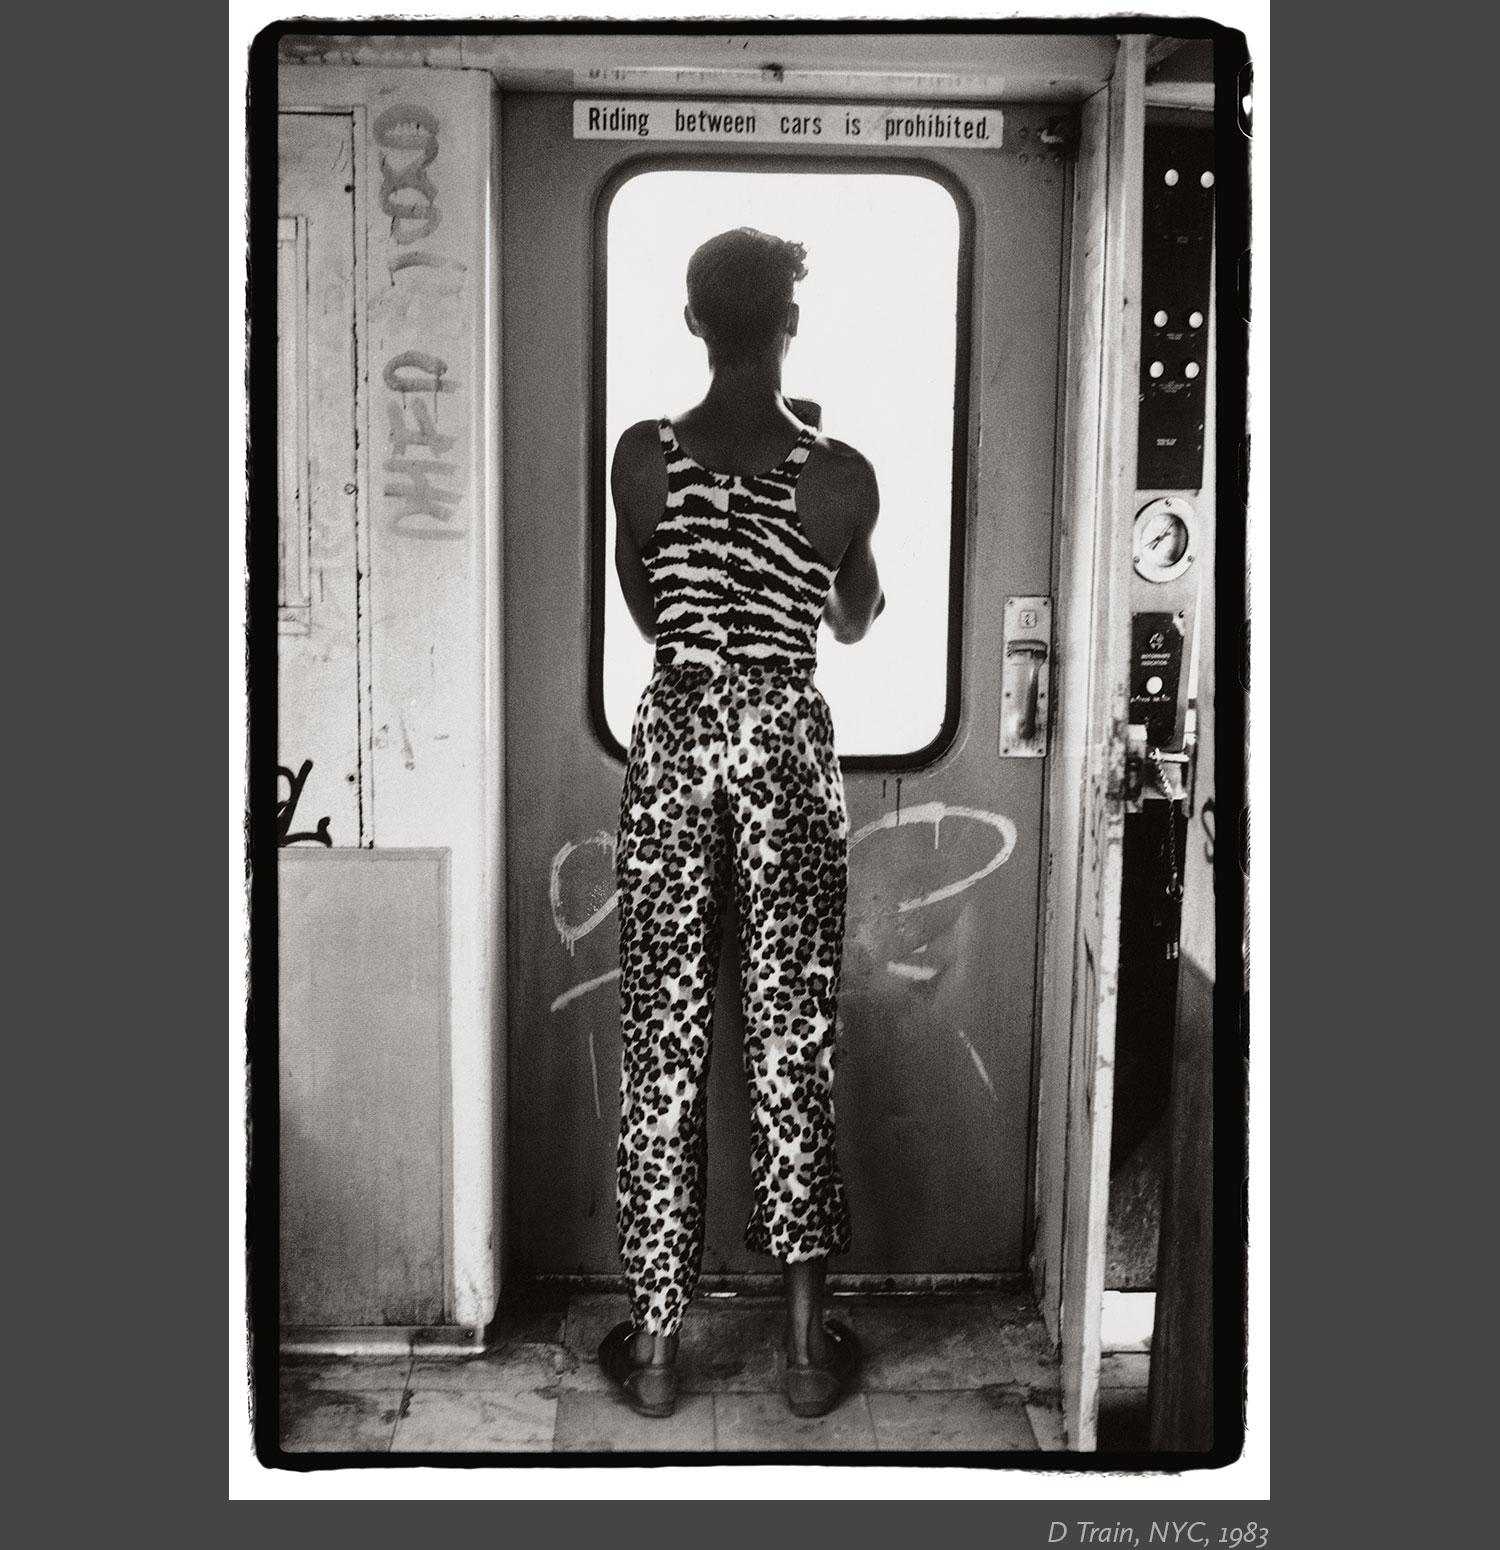 6_D-Train,-NYC,-1983.jpg